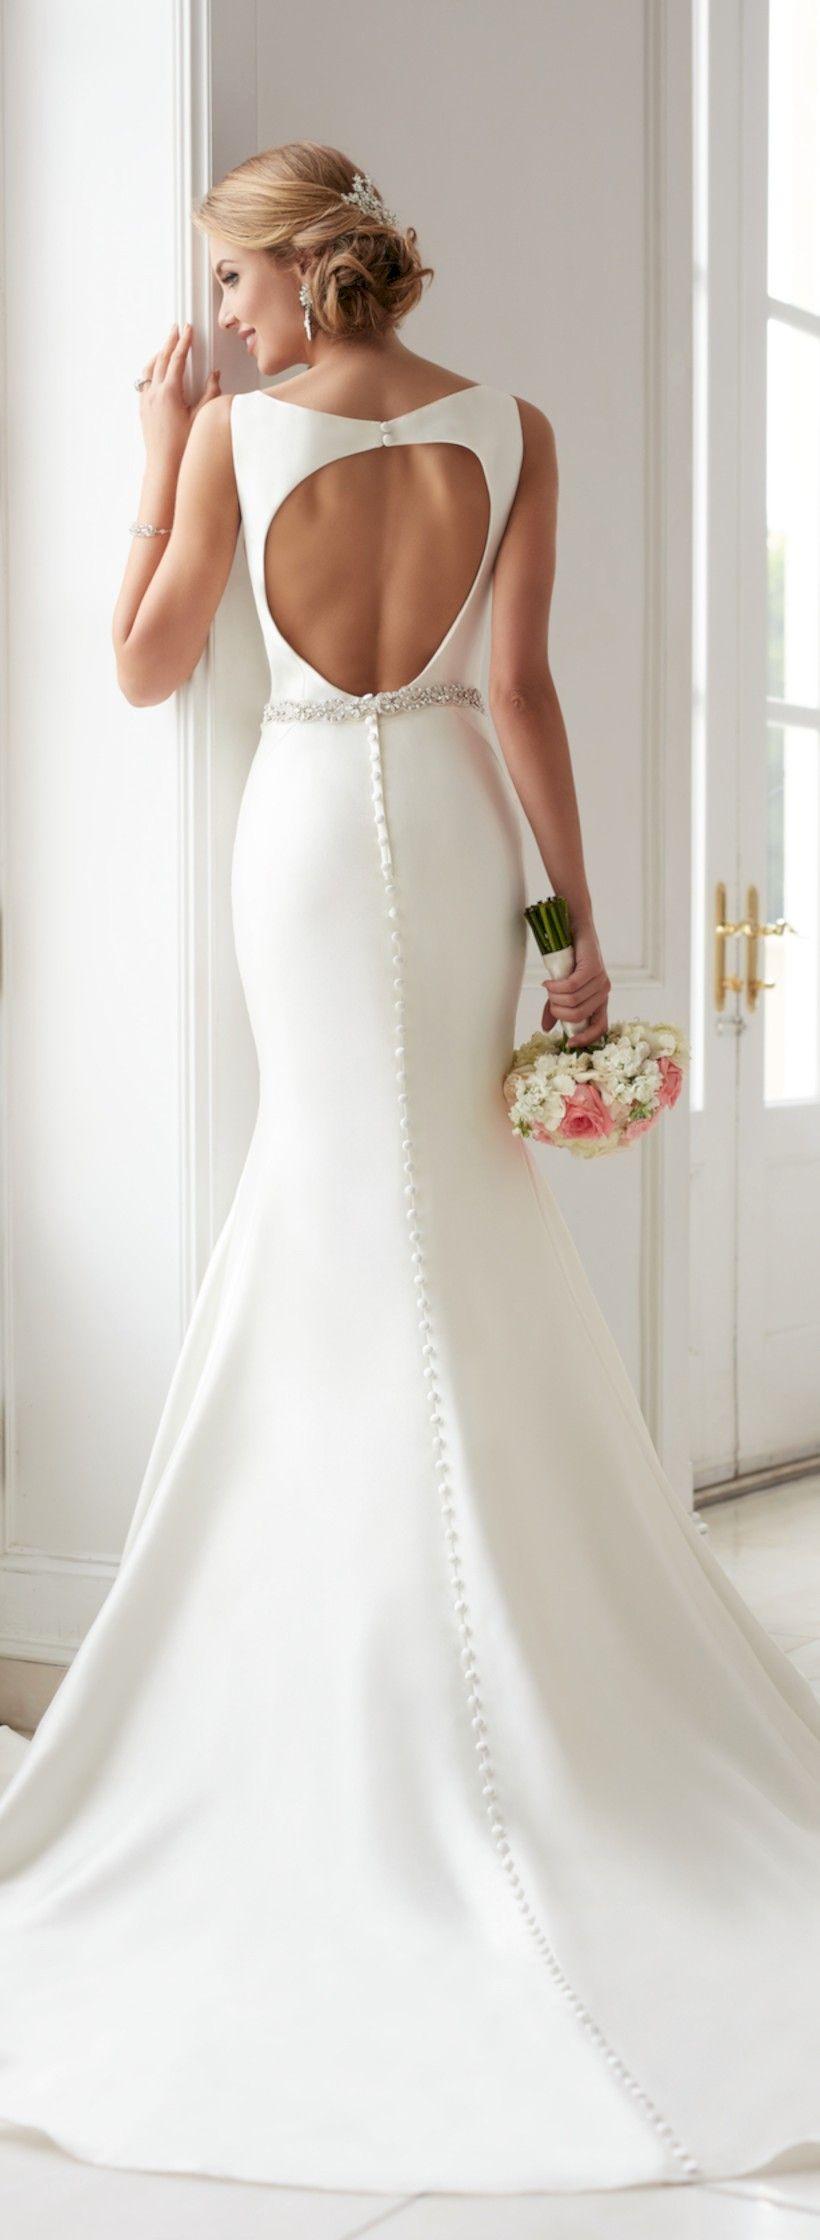 awesome 55 Vintage Winter Wedding Dress Ideas 2017 https://viscawedding.com/2017/10/09/55-vintage-winter-wedding-dress-ideas-2017/